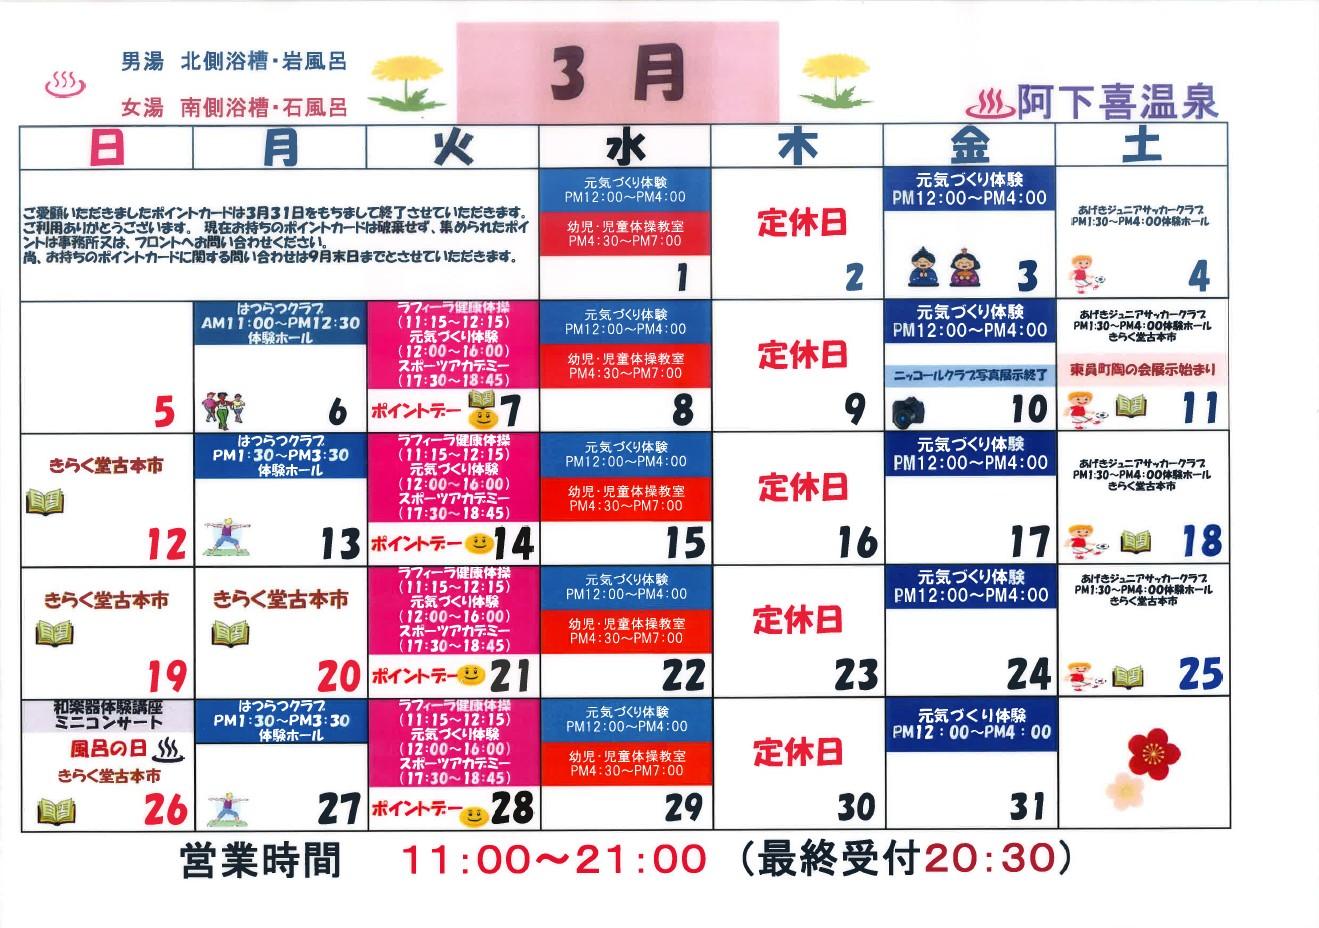 http://www.ajisainosato.com/info/images/2017y02m24d_190005190.jpg